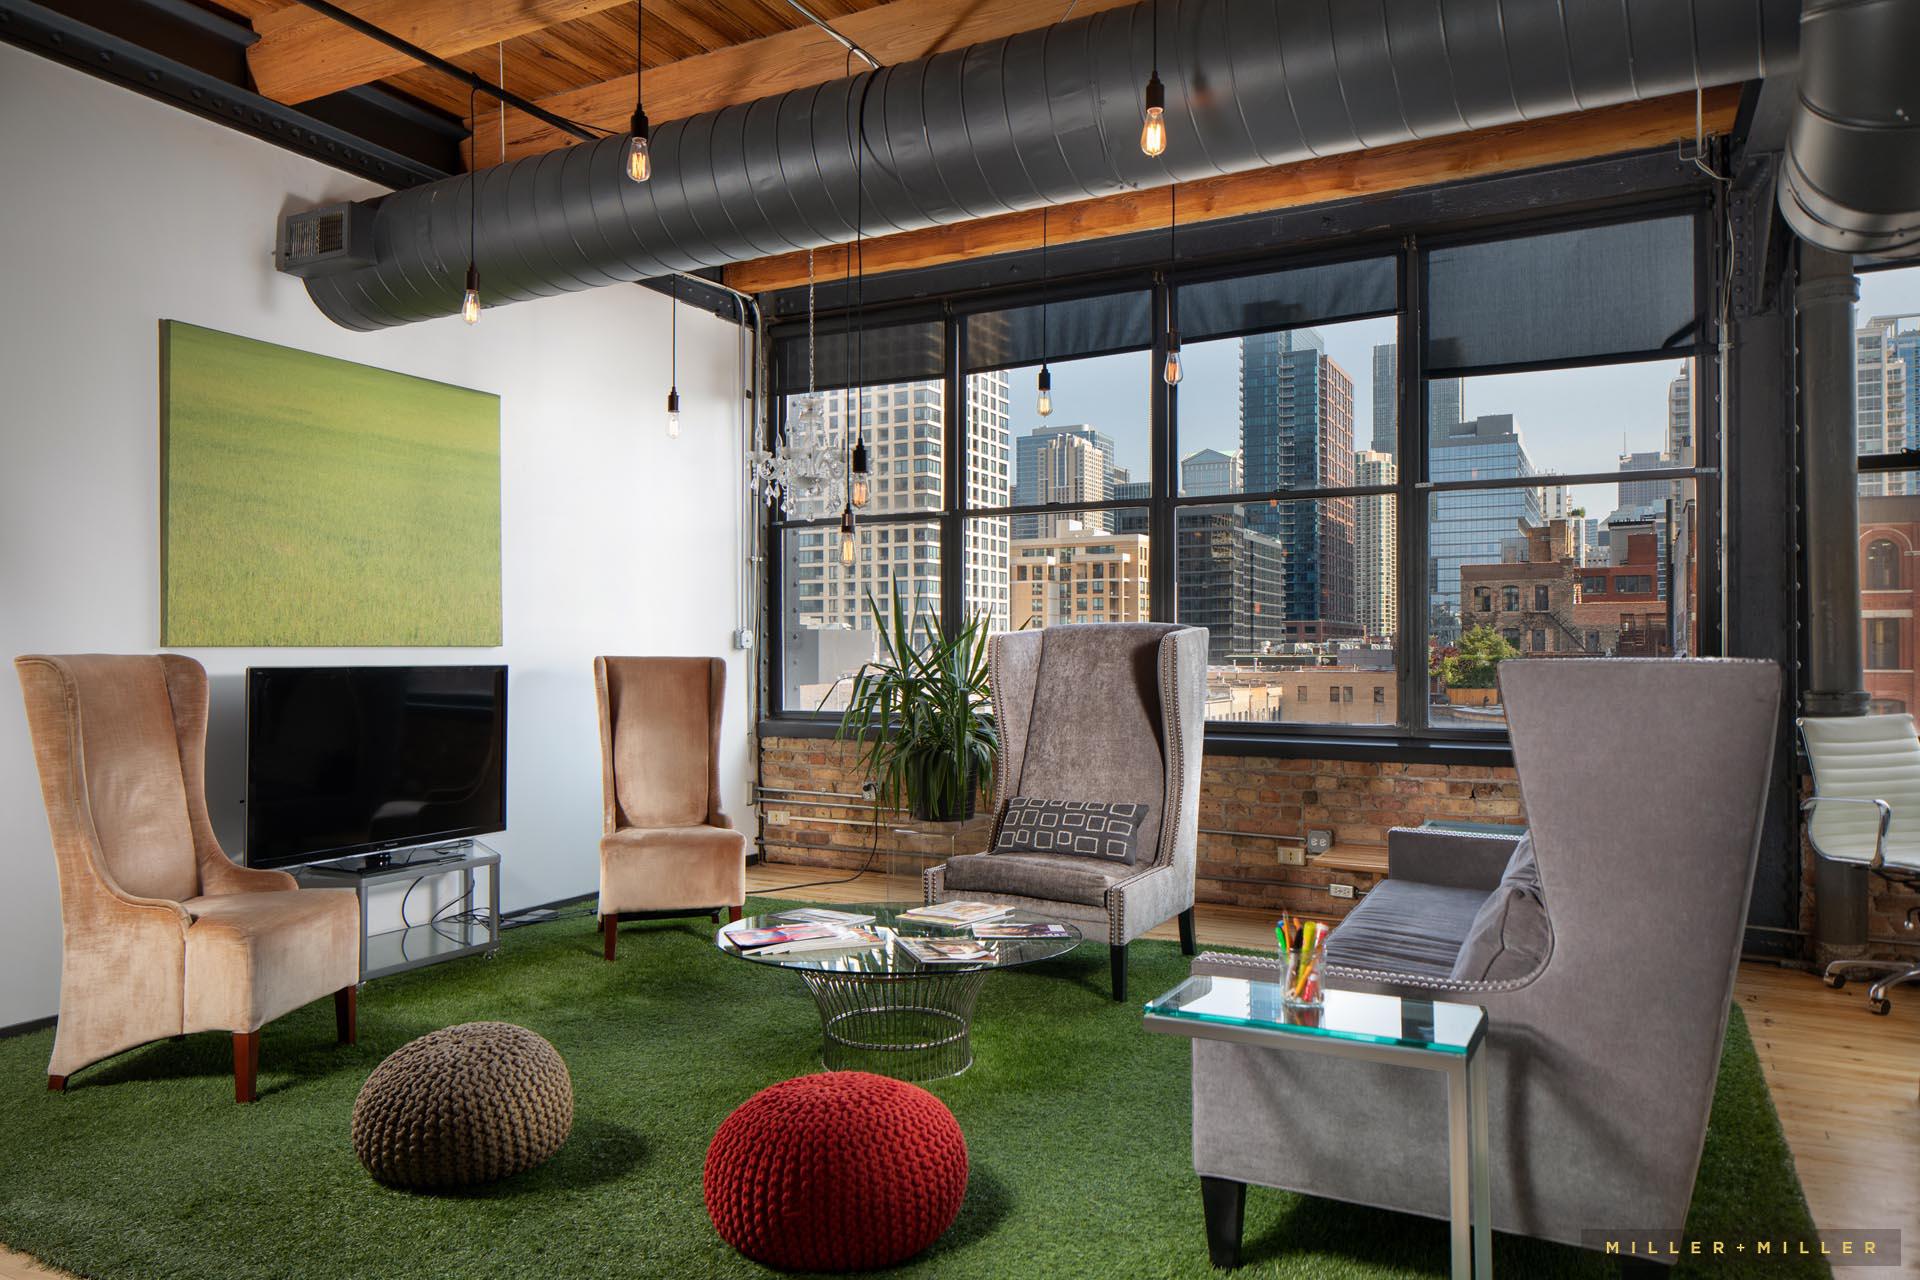 Chicago interiors photography